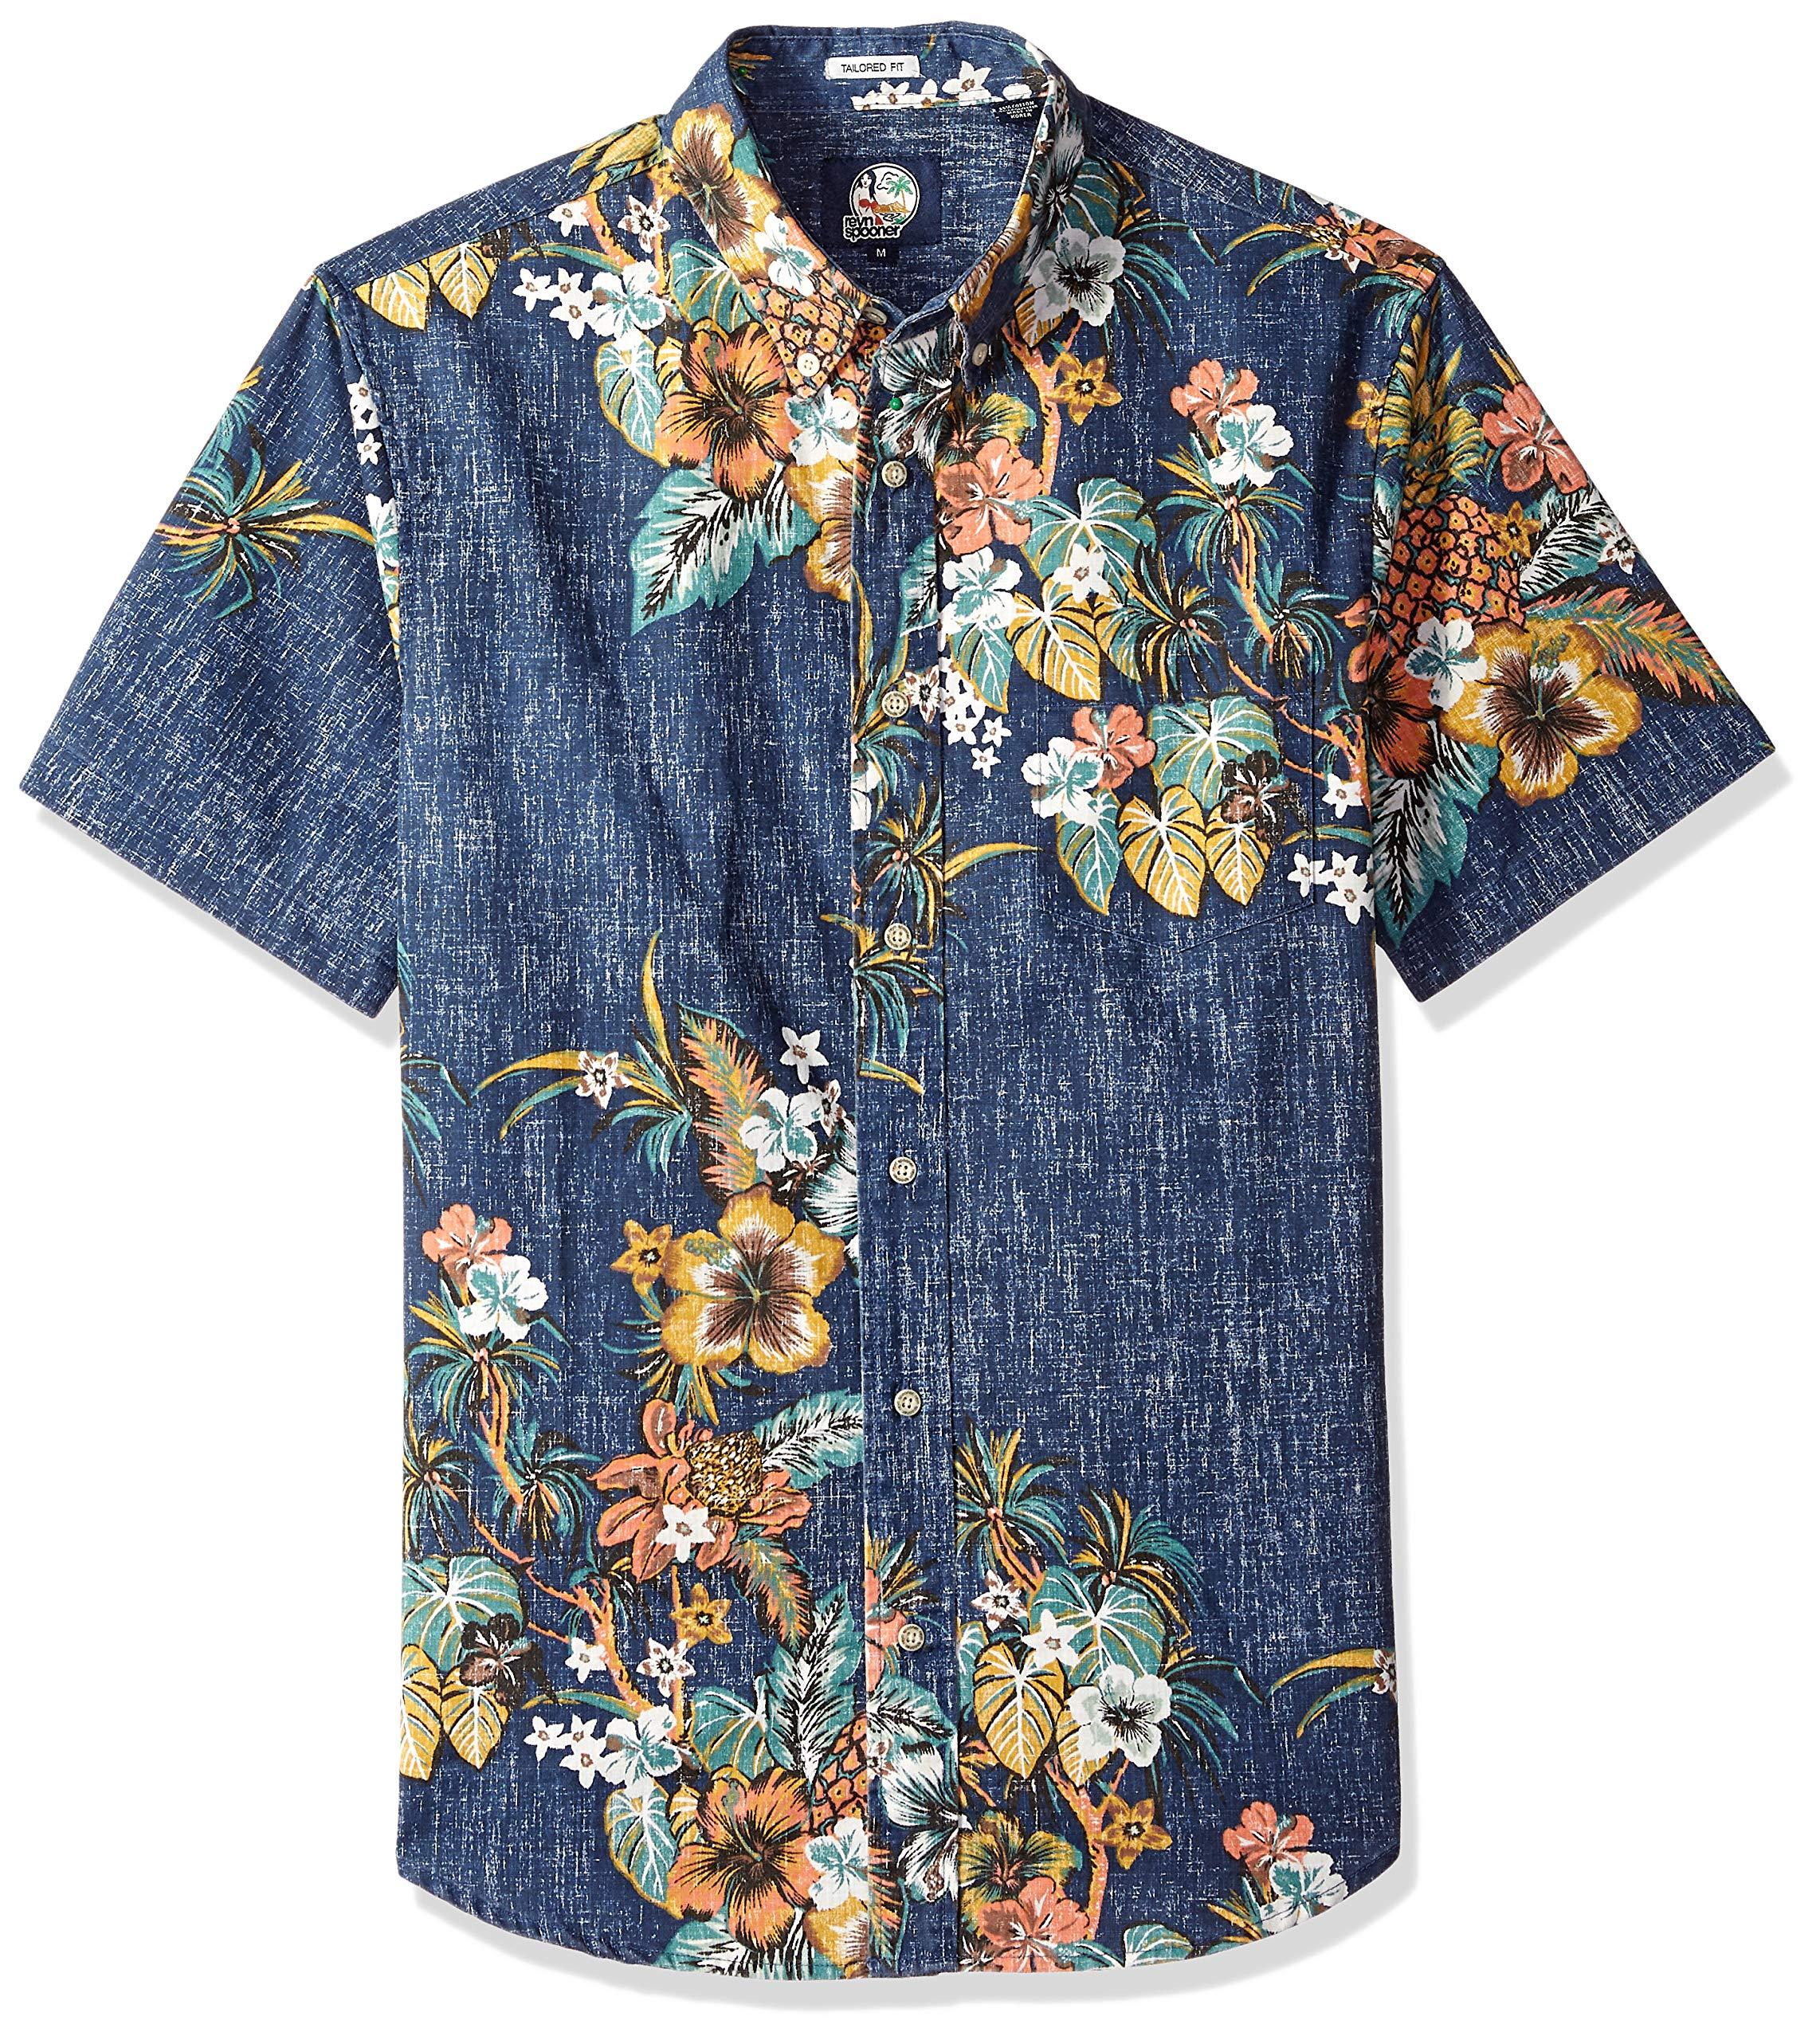 Reyn Spooner Men's Pupus and Mai Tais Weekend Wash Tailored Fit Hawaiian Shirt, Ink, XXL